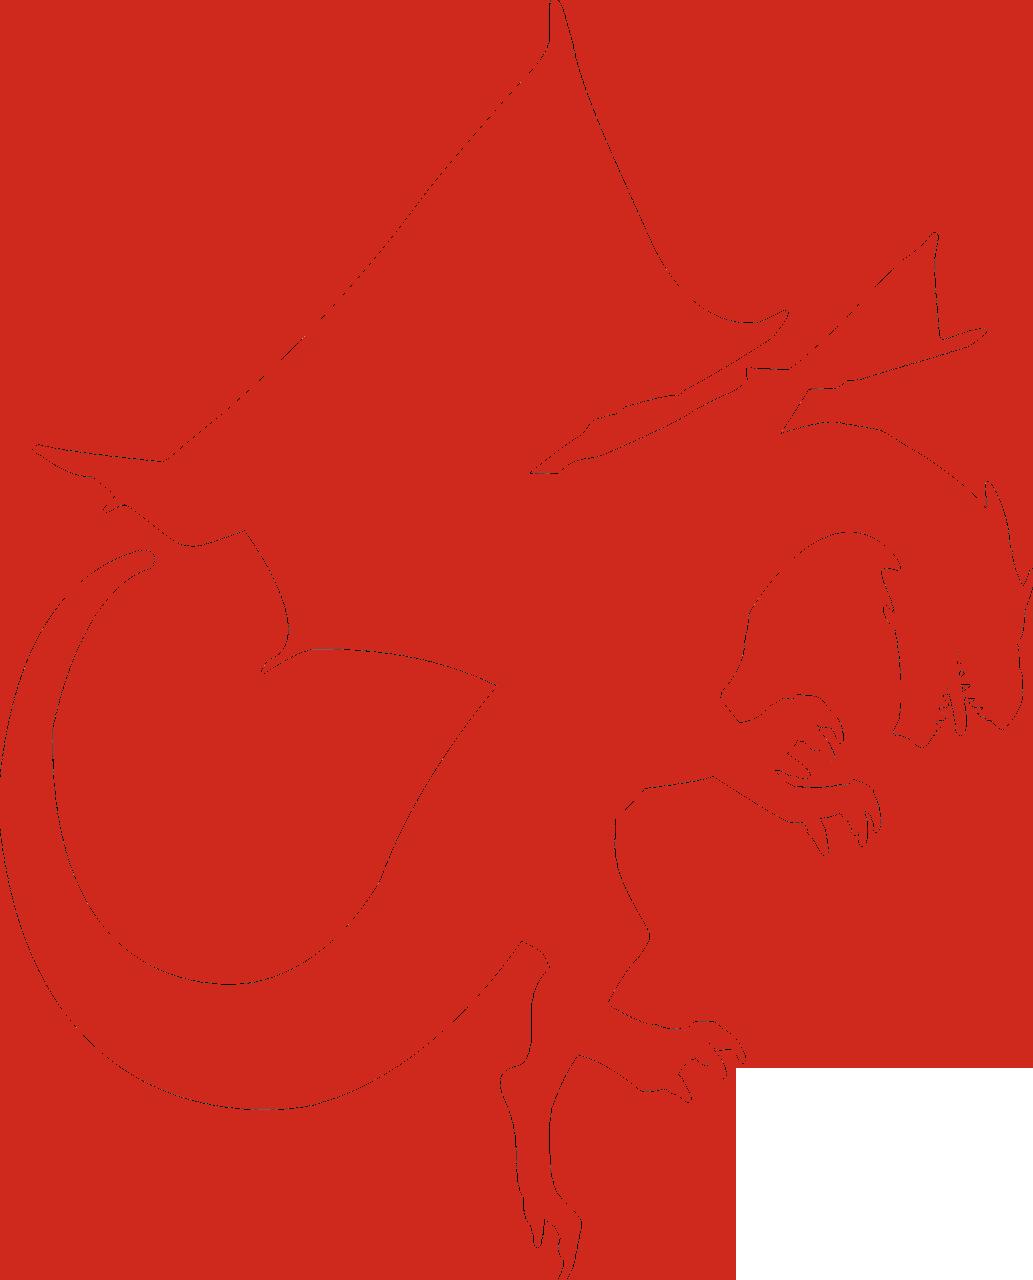 5E Generator dungeons & dragons random encounter